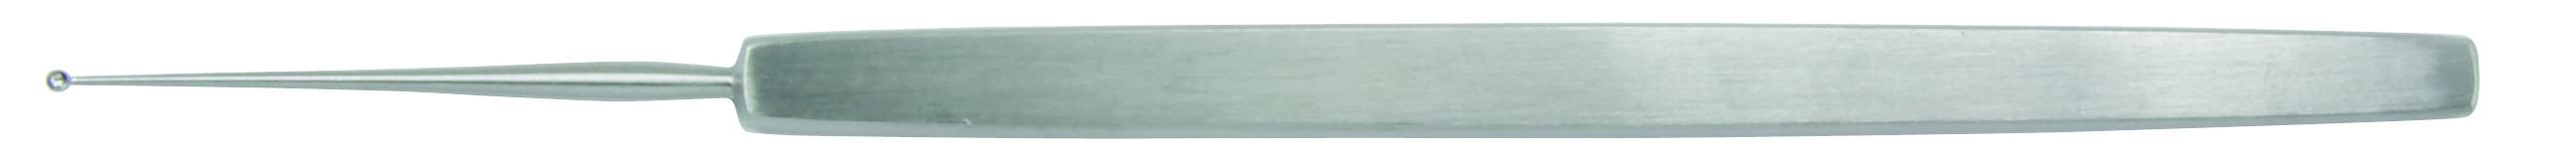 meyhoefer-chalazion-curette-size-00-1-mm-18-498-miltex.jpg